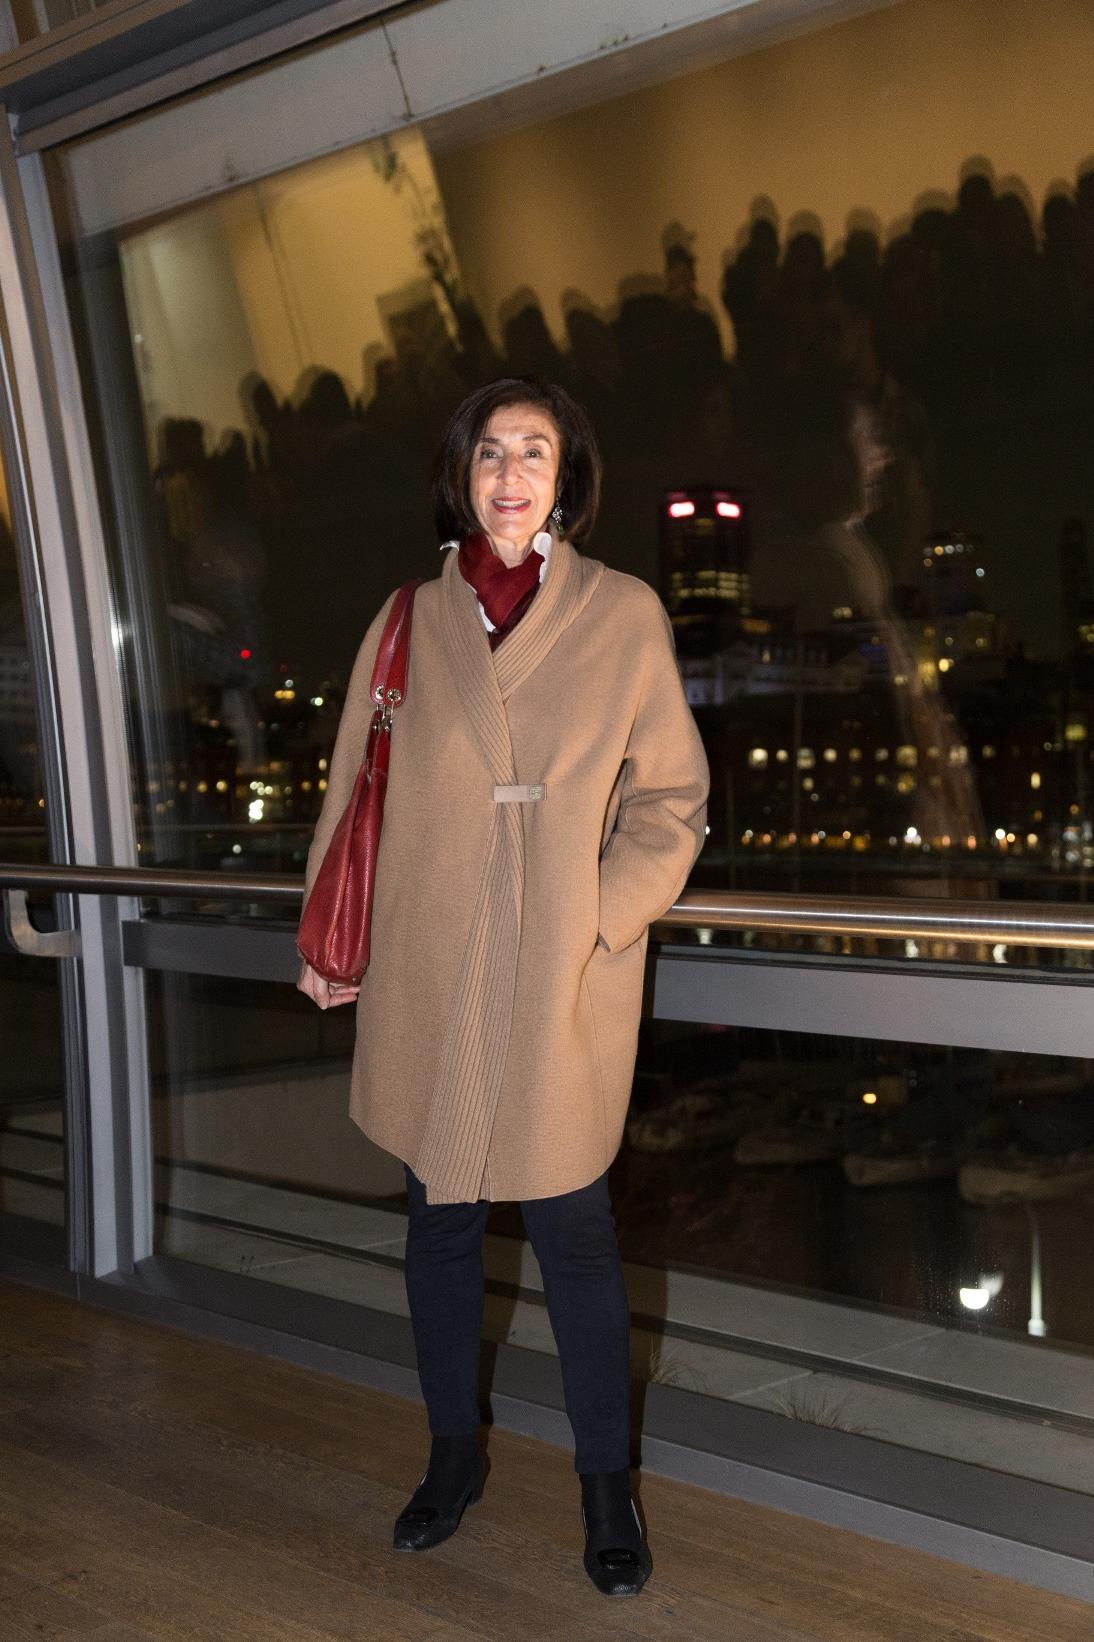 Cristina Carlisle, directora de Christie's Argentina y Uruguay